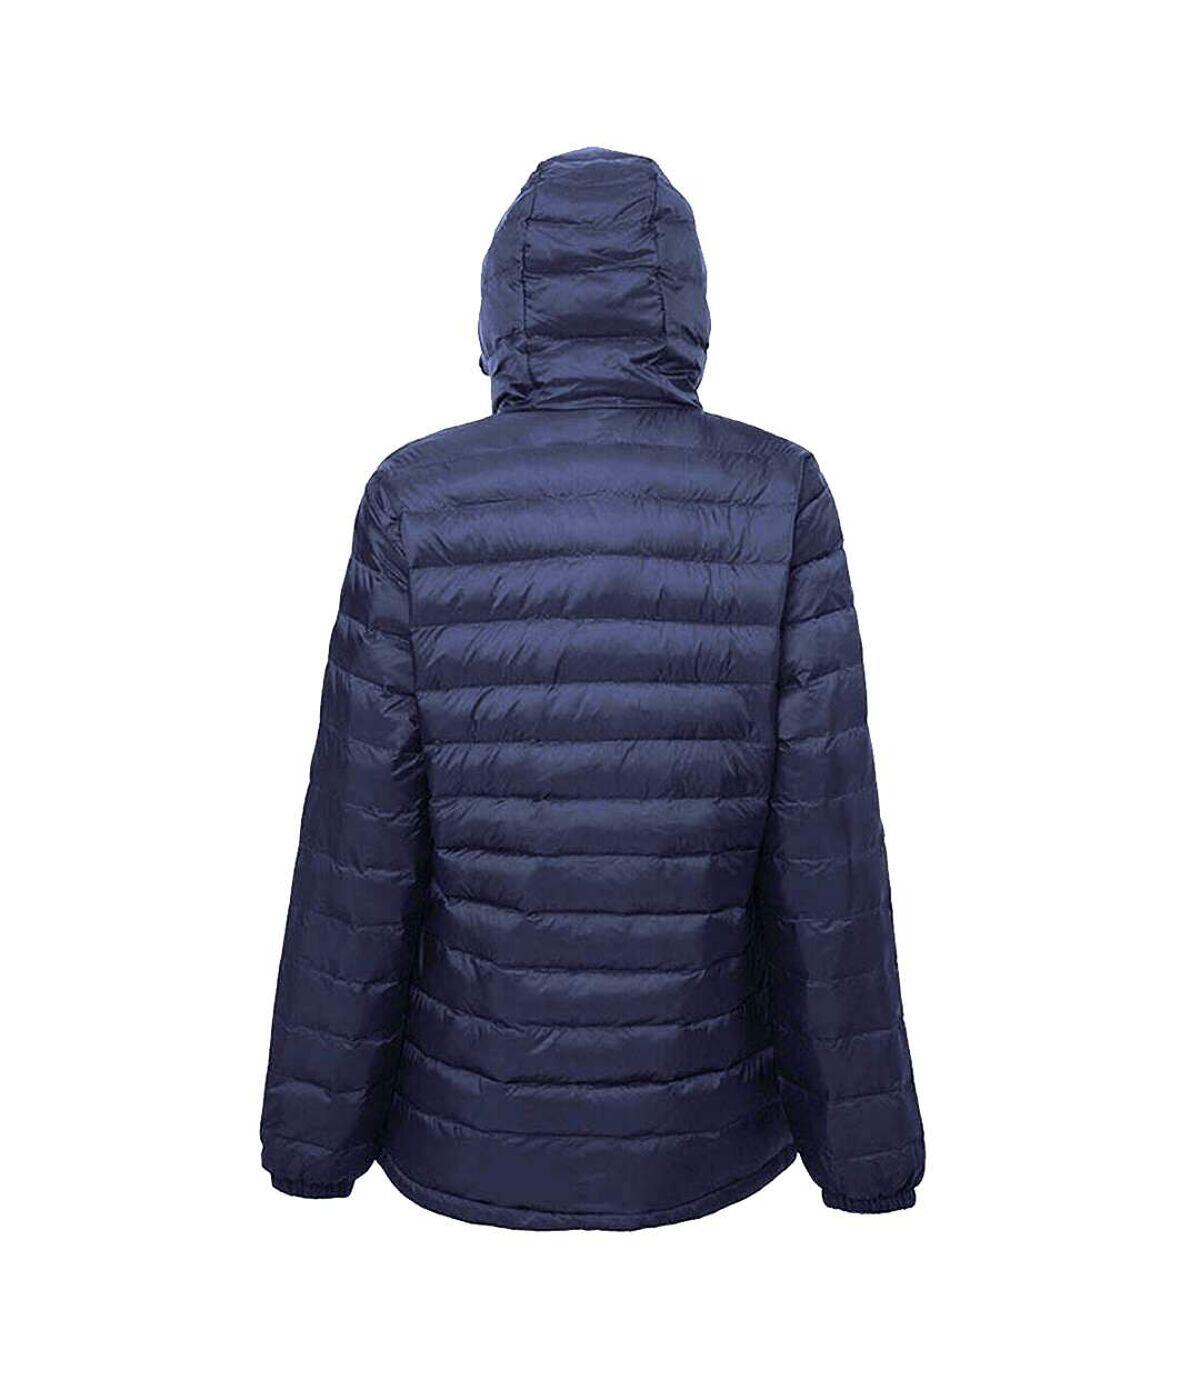 2786 Mens Hooded Water & Wind Resistant Padded Jacket (Camo Grey) - UTRW3424